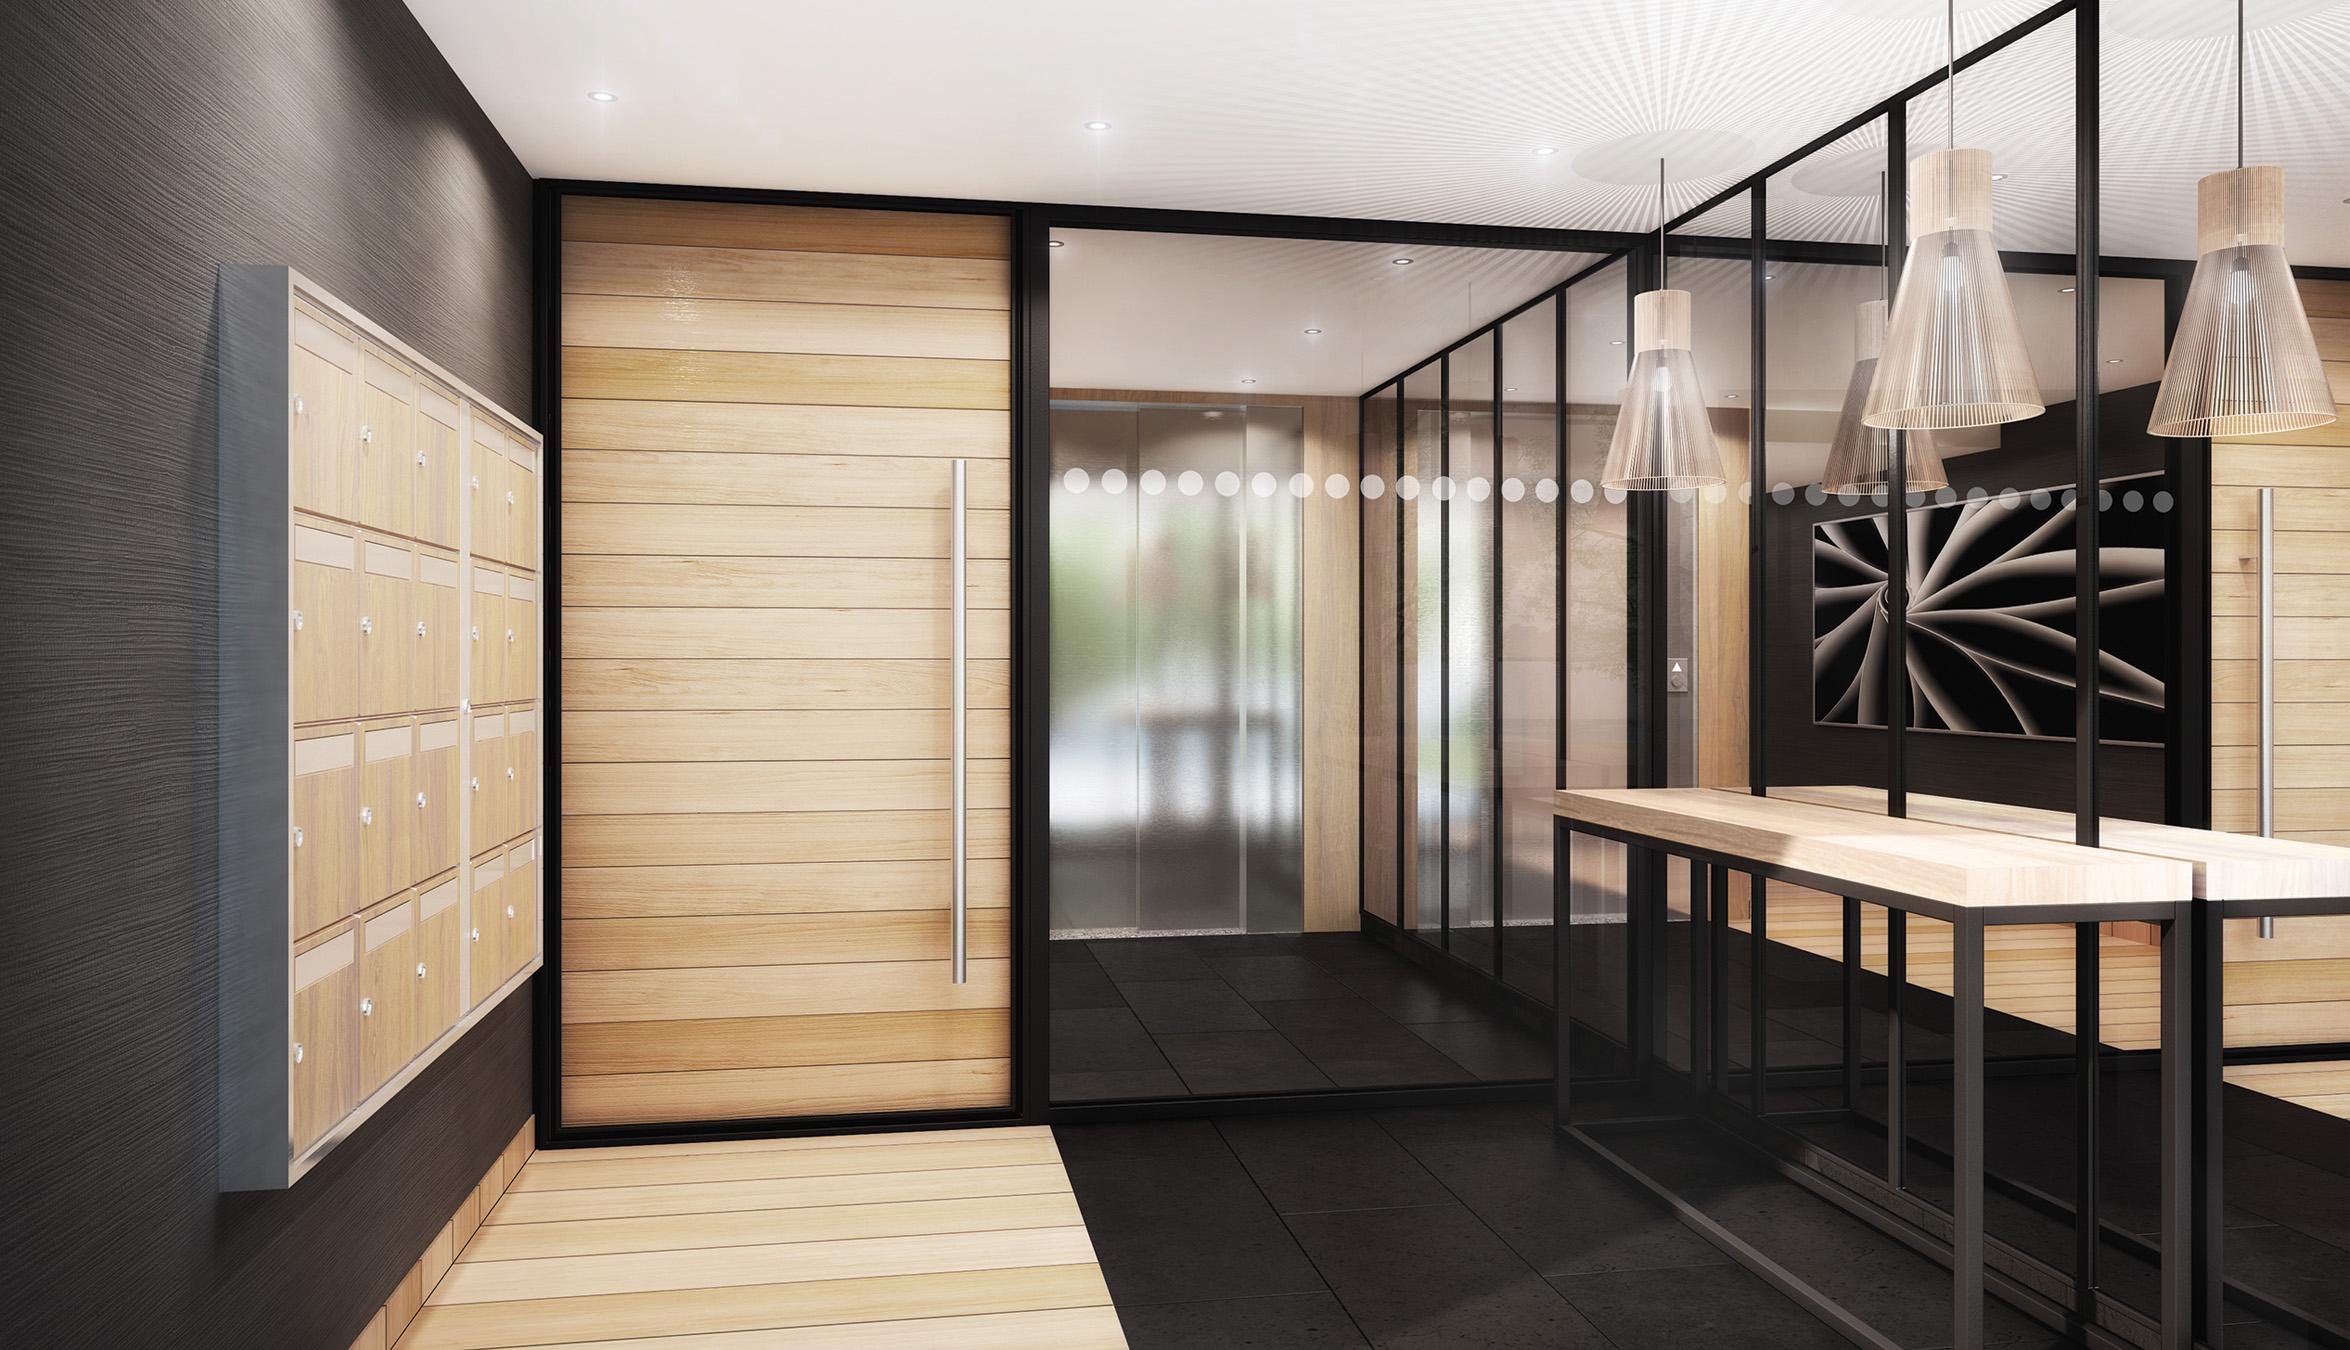 bois d 39 arcy 30 mn de paris montparnasse. Black Bedroom Furniture Sets. Home Design Ideas